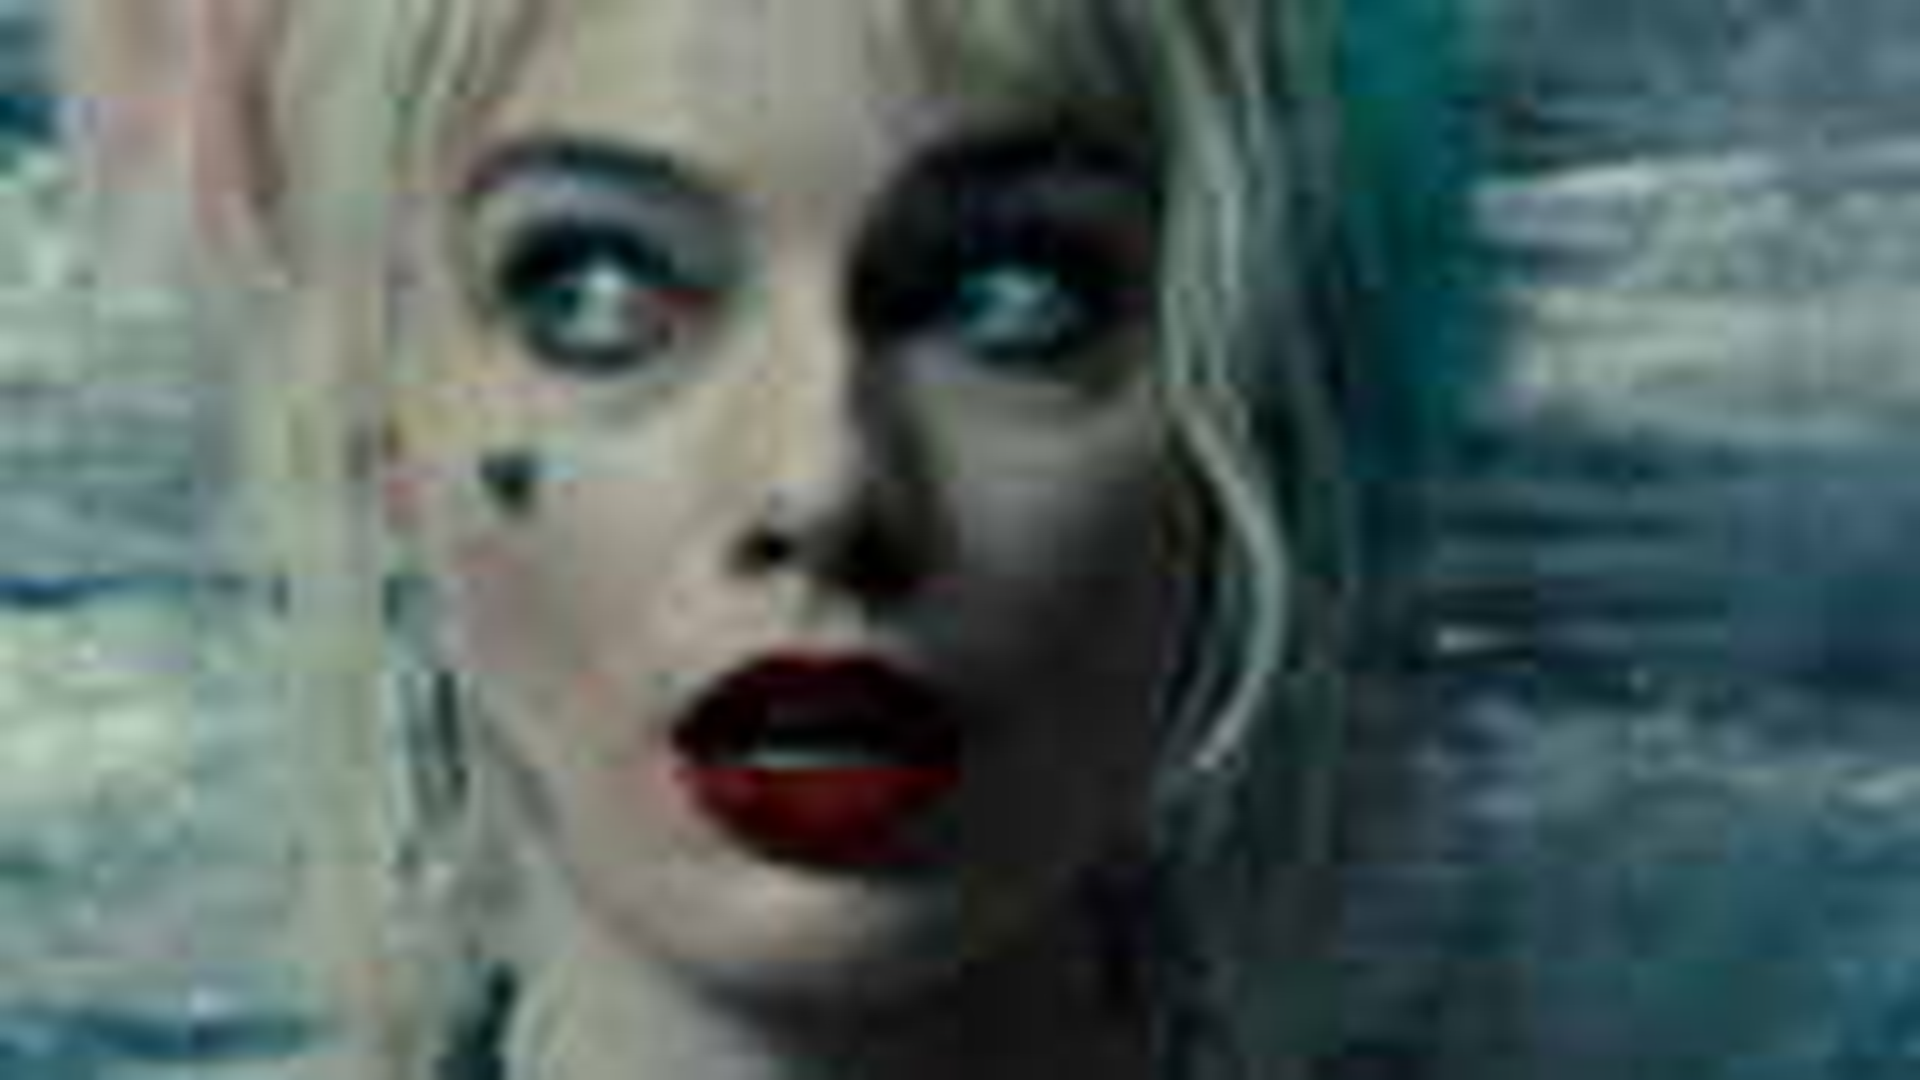 DC《猛禽小队》全新预告,大反派黑面具登场!